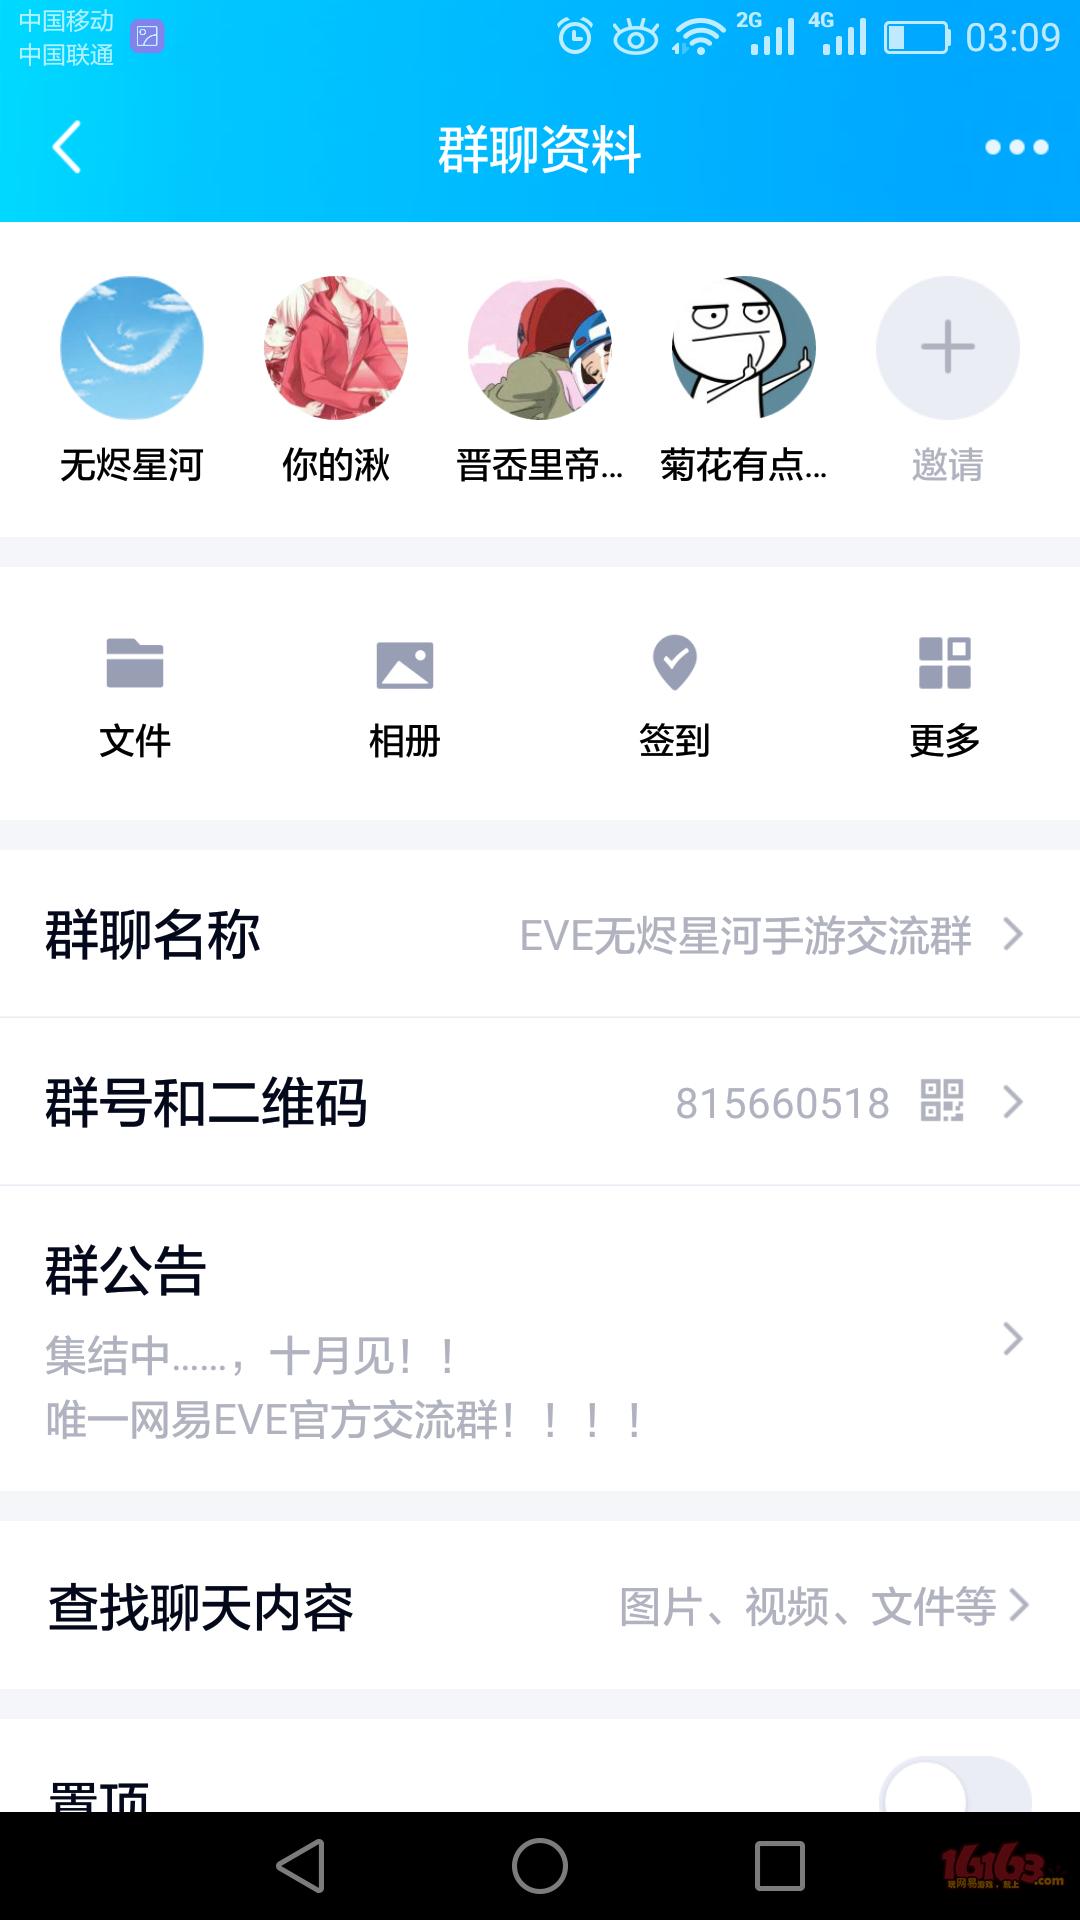 Screenshot_2019-08-22-03-09-45.png